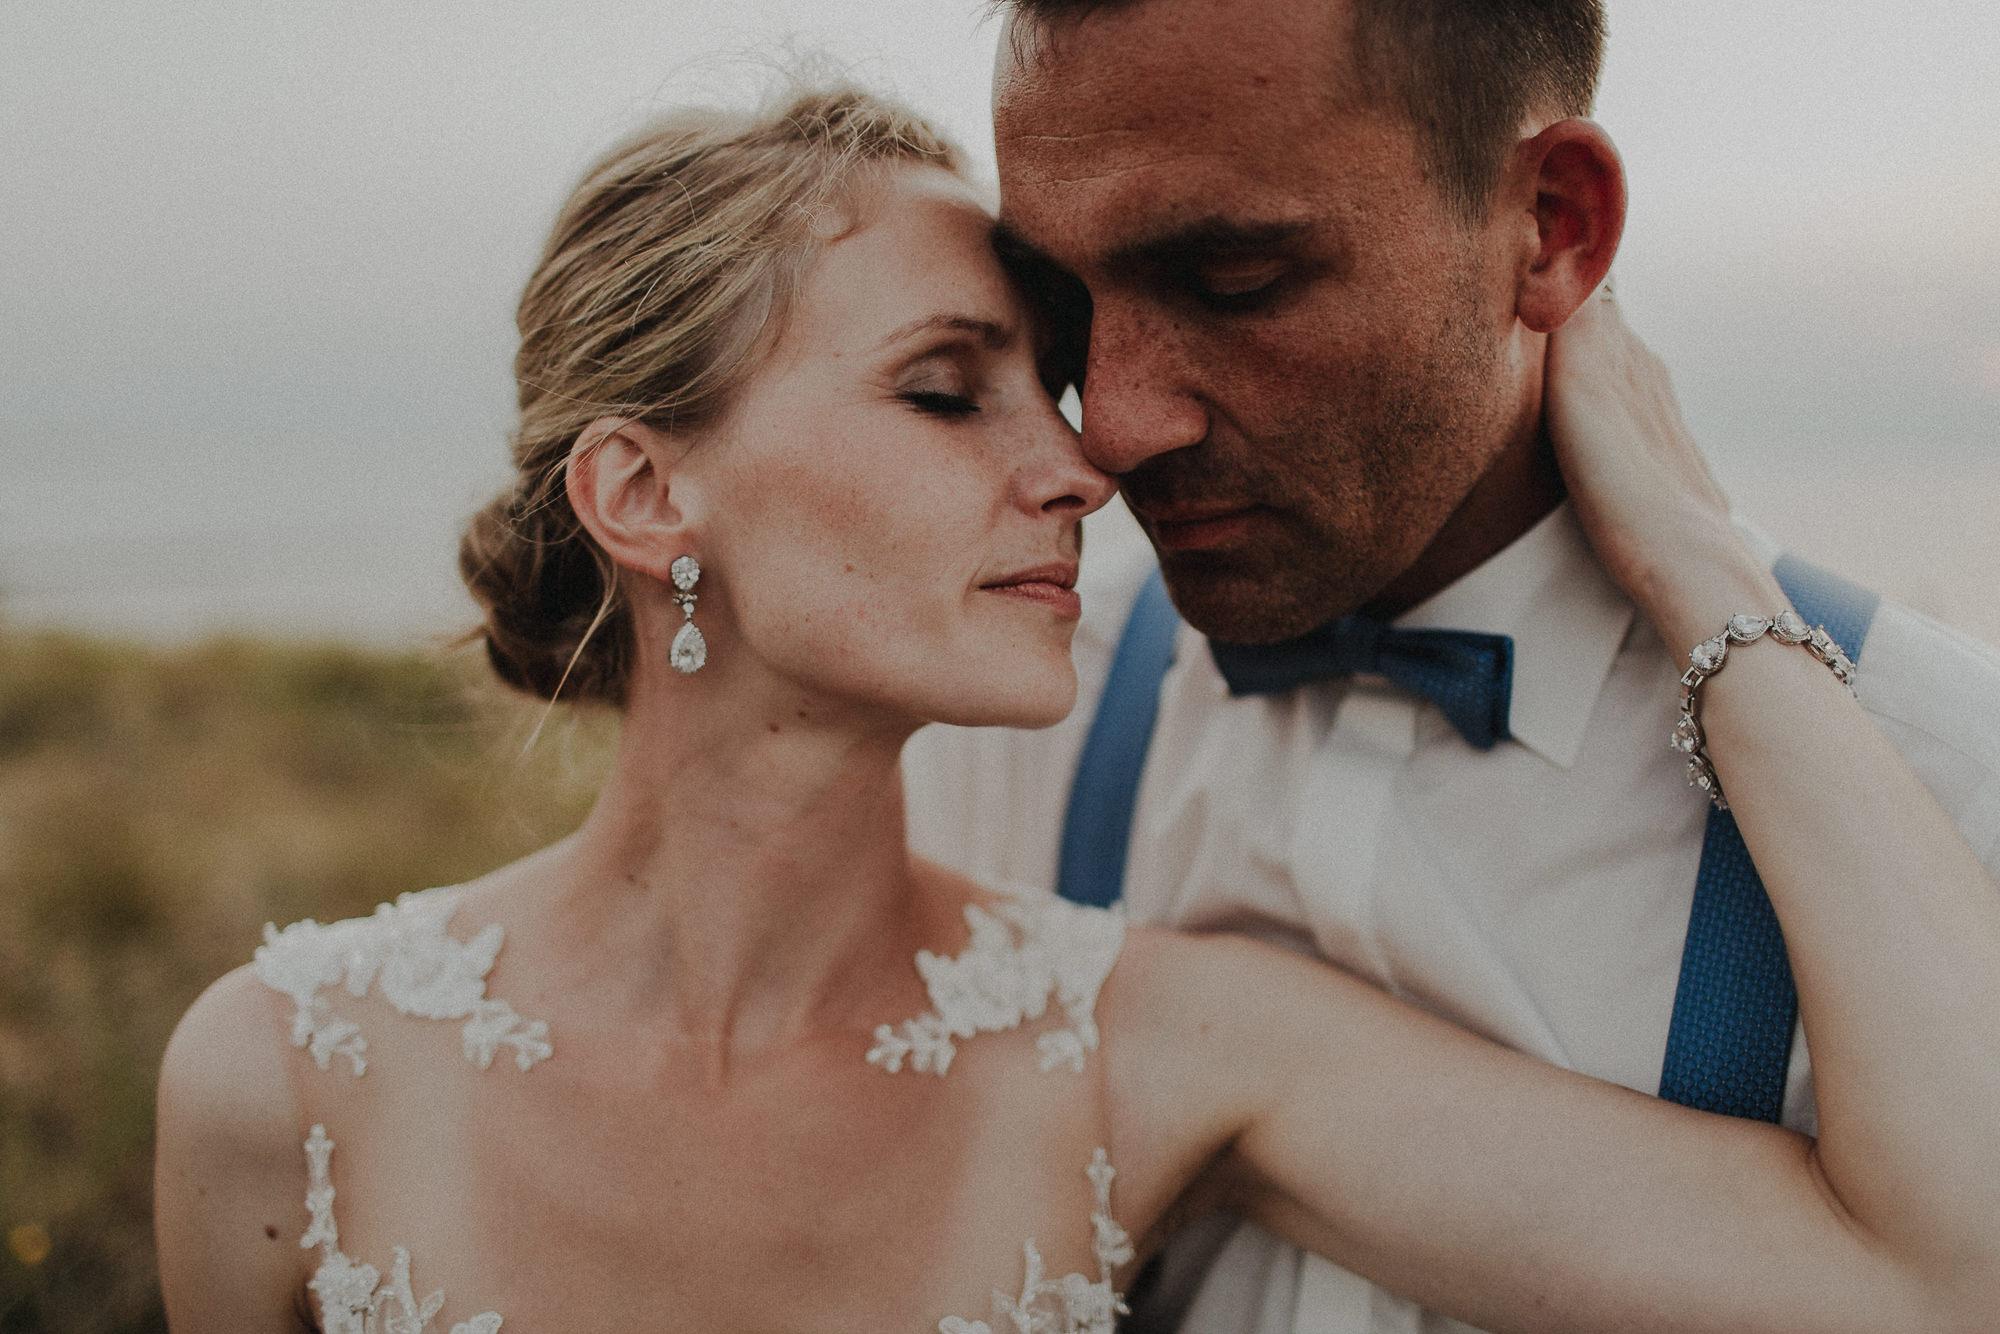 Hochzeitsfotograf-Potsdam-Tom-und-Lia-Fotografie-5DT_6010